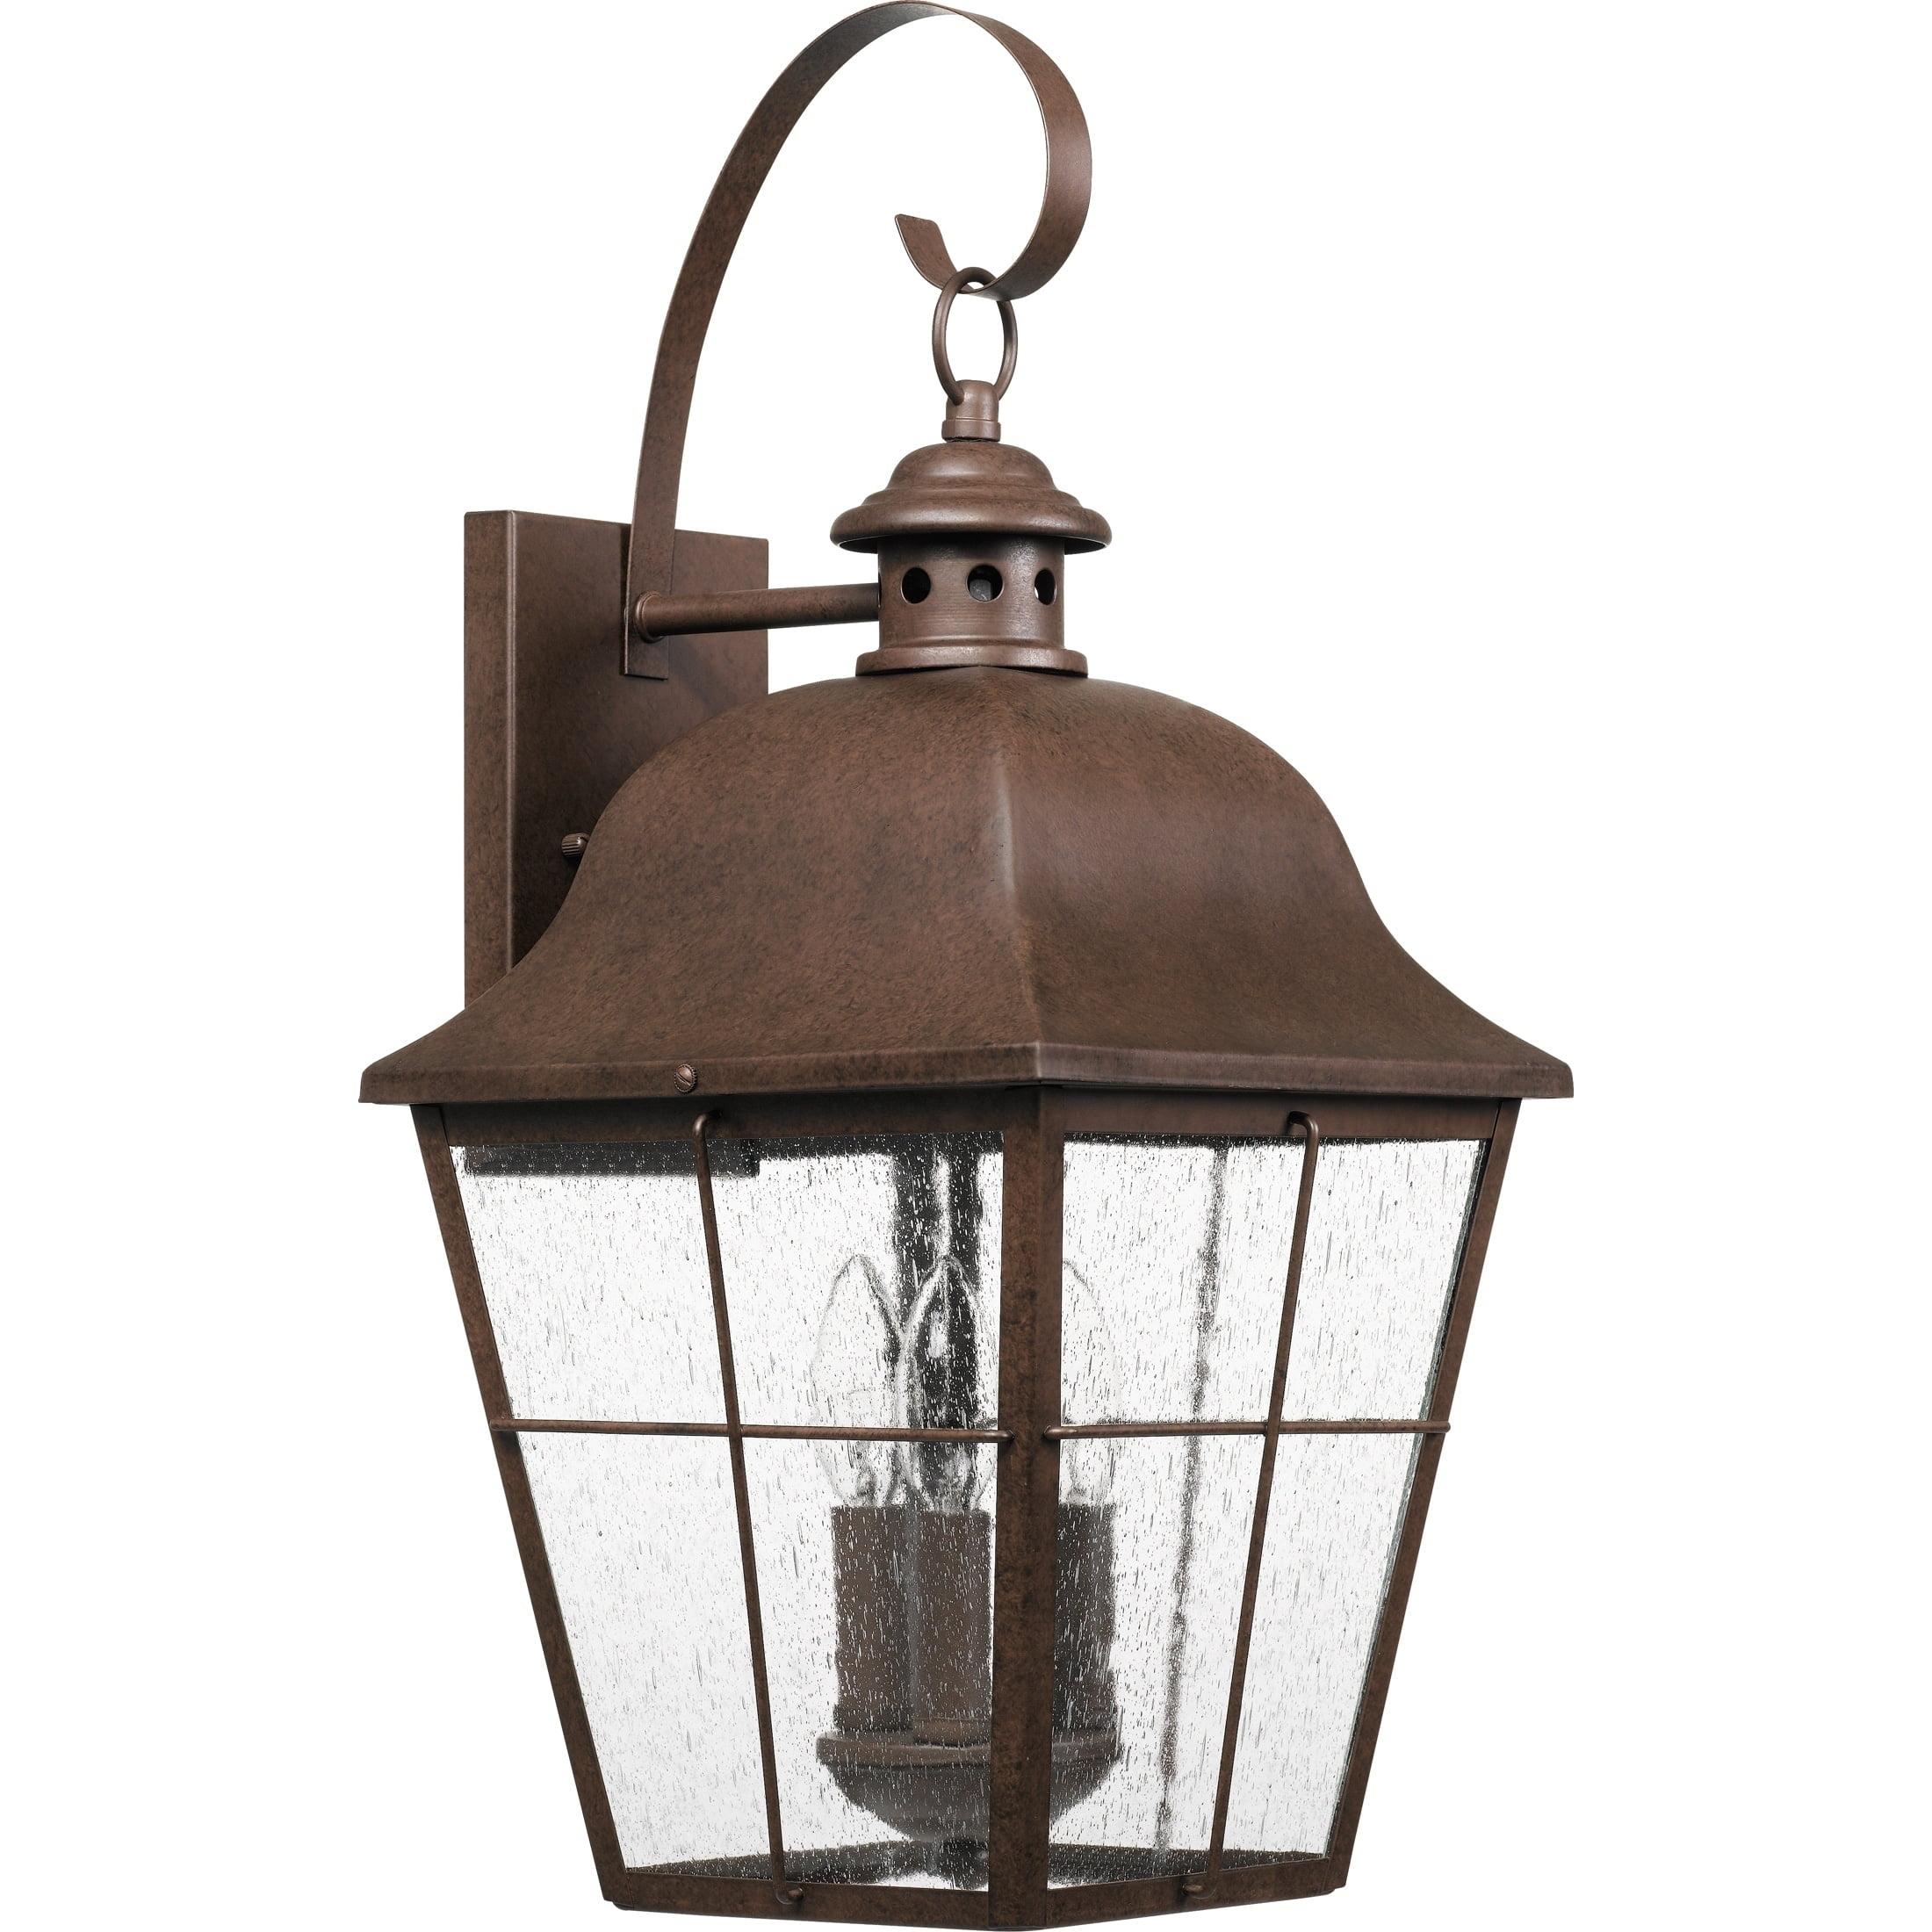 Quoizel Millhouse MHE84CU Outdoor Wall Lantern